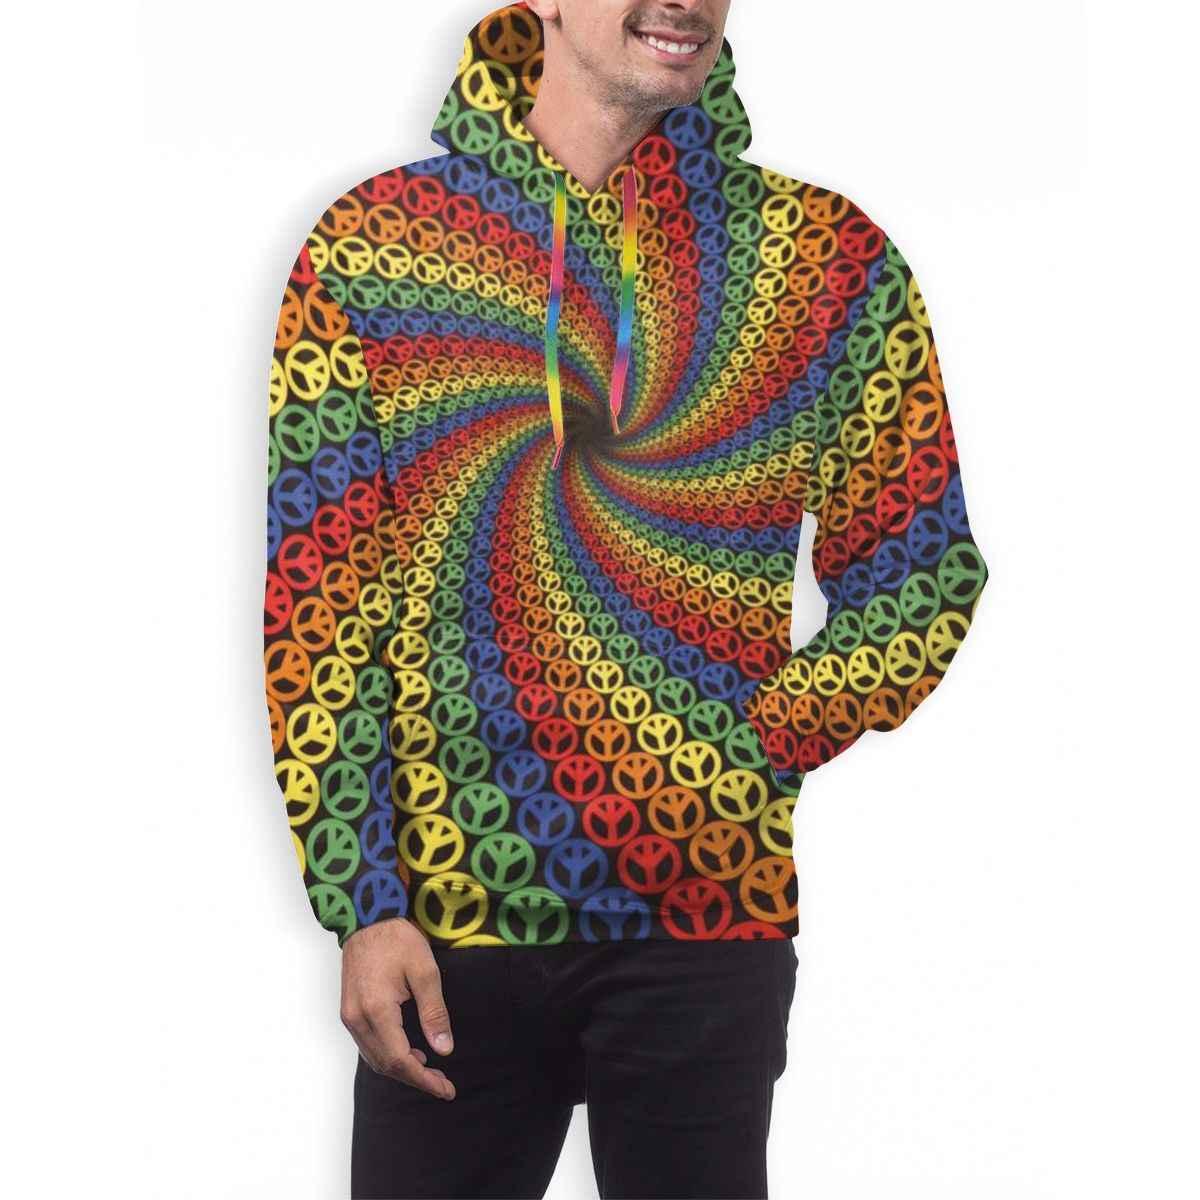 3D Digitale All Over Print Spirale Frieden Psychedelic Hippie Regenbogen Mens Casual Hoodie Mit Kapuze Pullover Hoody Mit Tasche